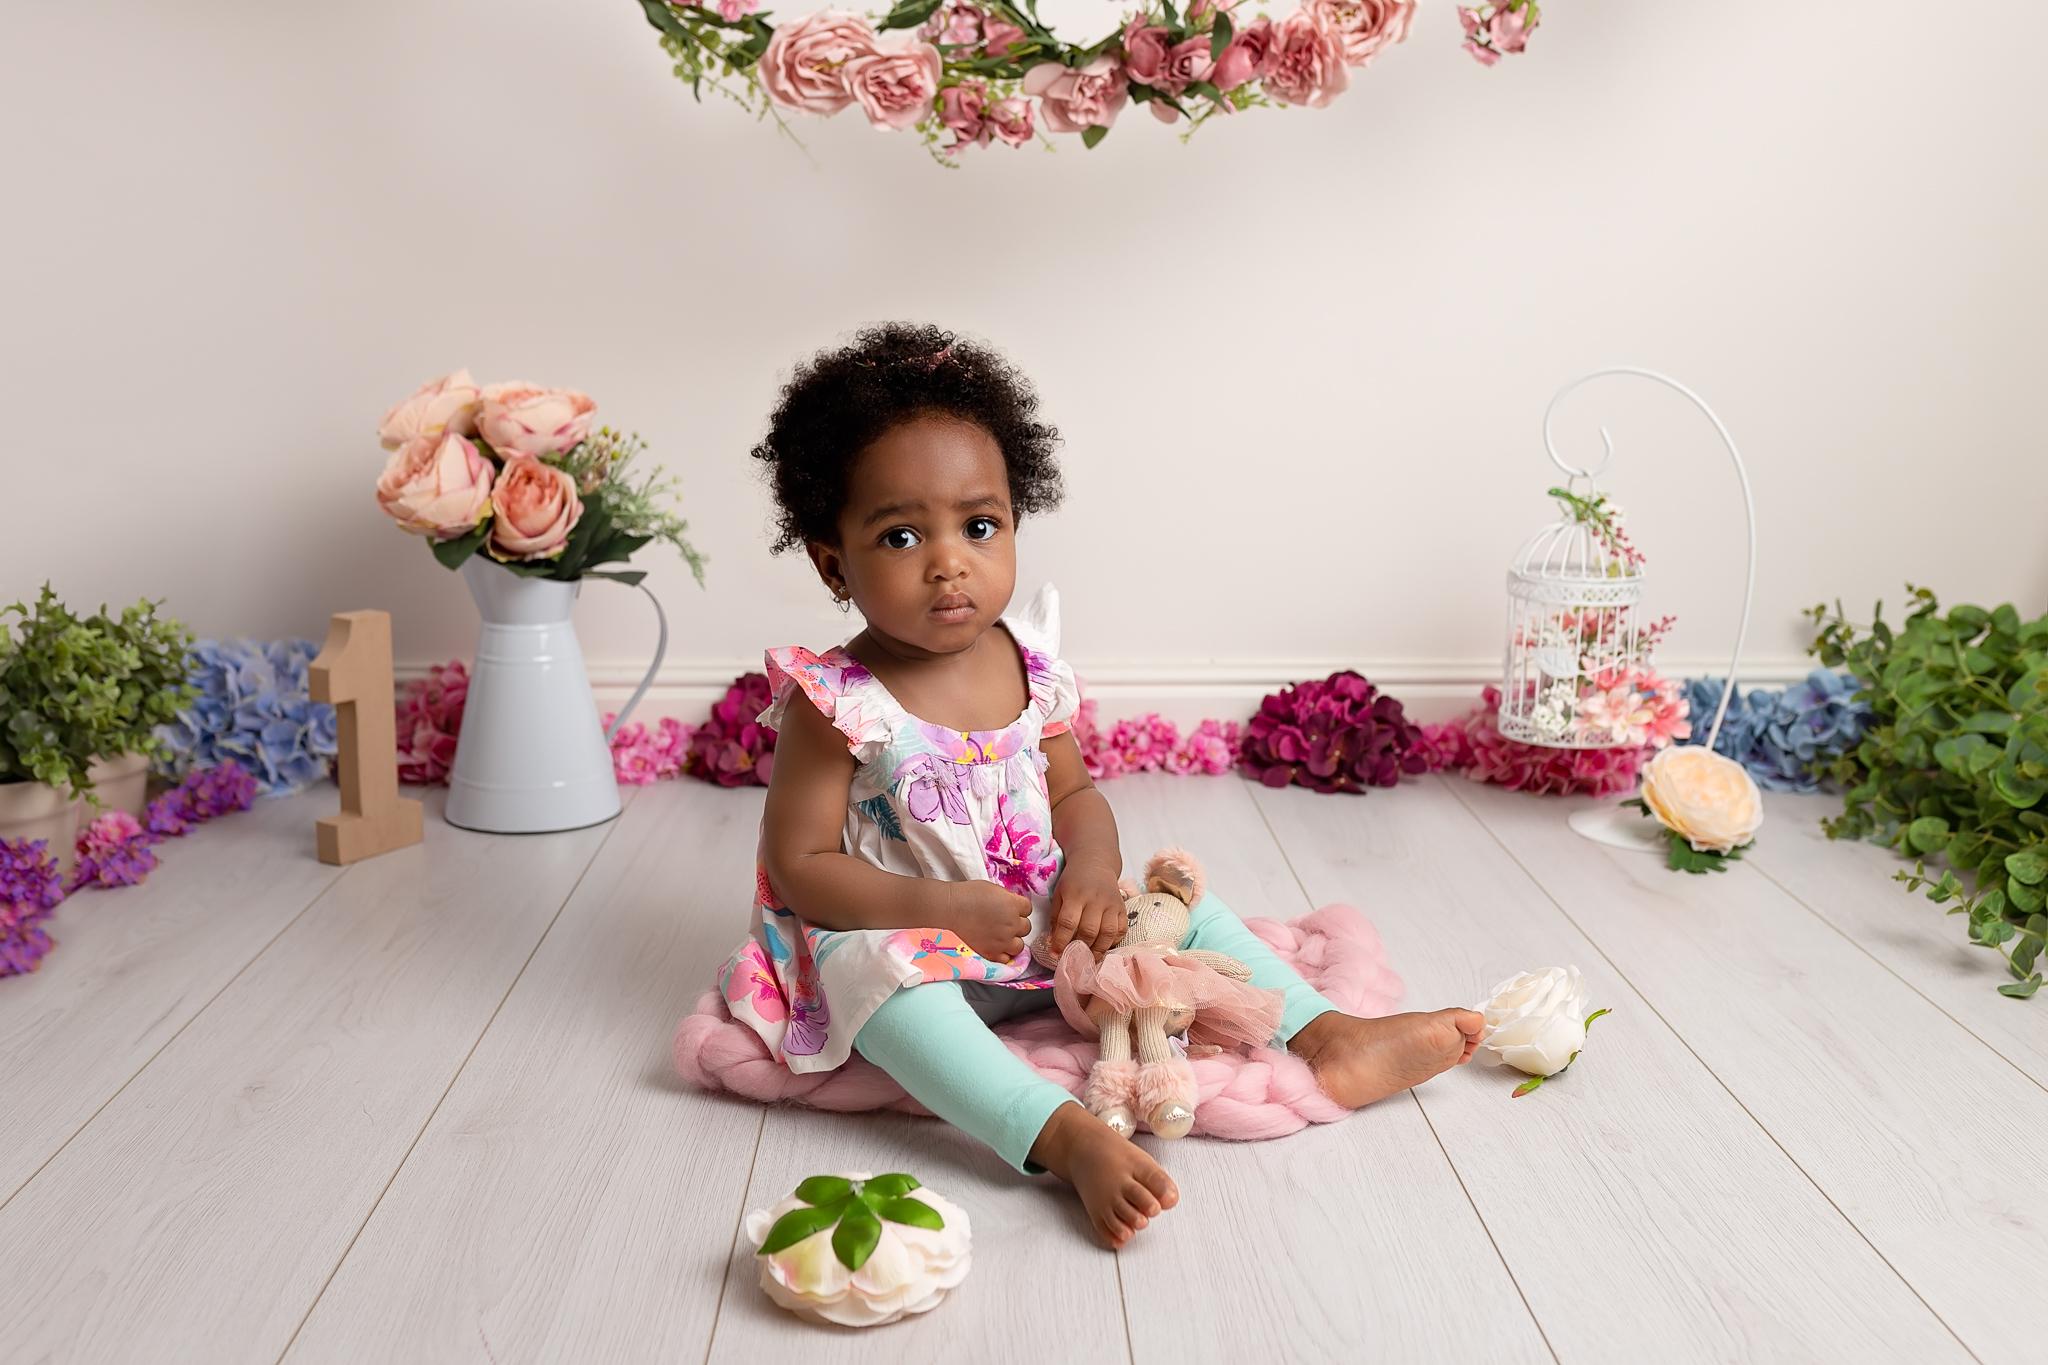 Professional baby photography Leeds, Bradford, York, Harrogate, Wakefield: portrait of 1 year old baby girl